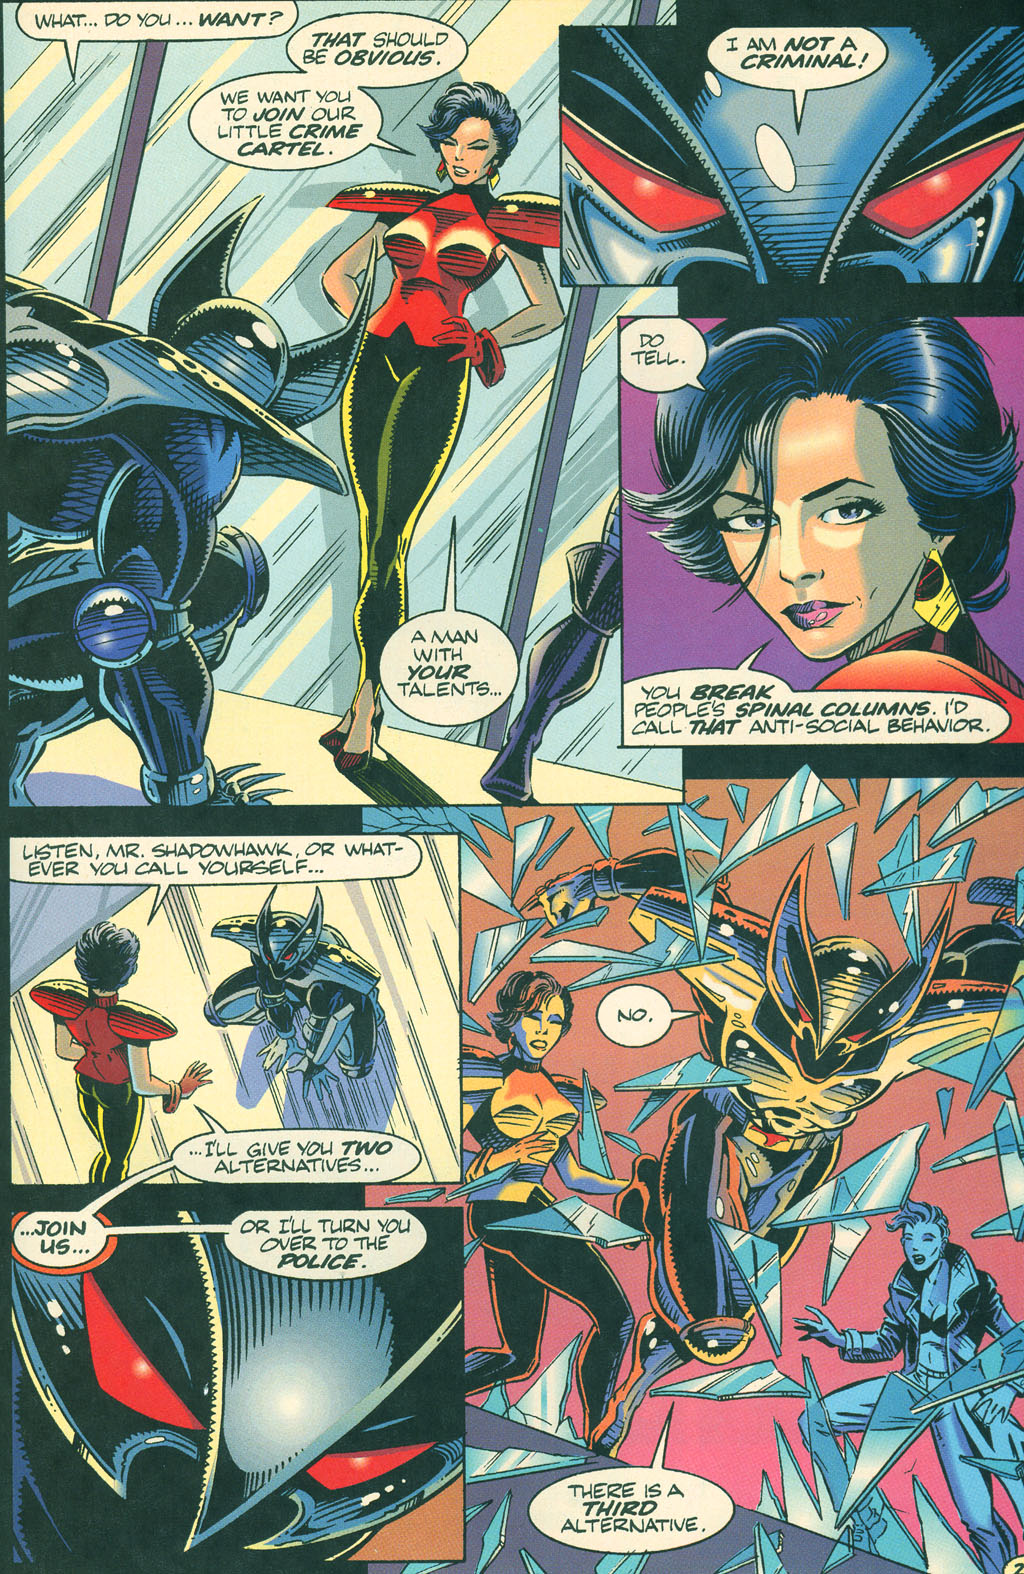 Read online ShadowHawk comic -  Issue #4 - 25